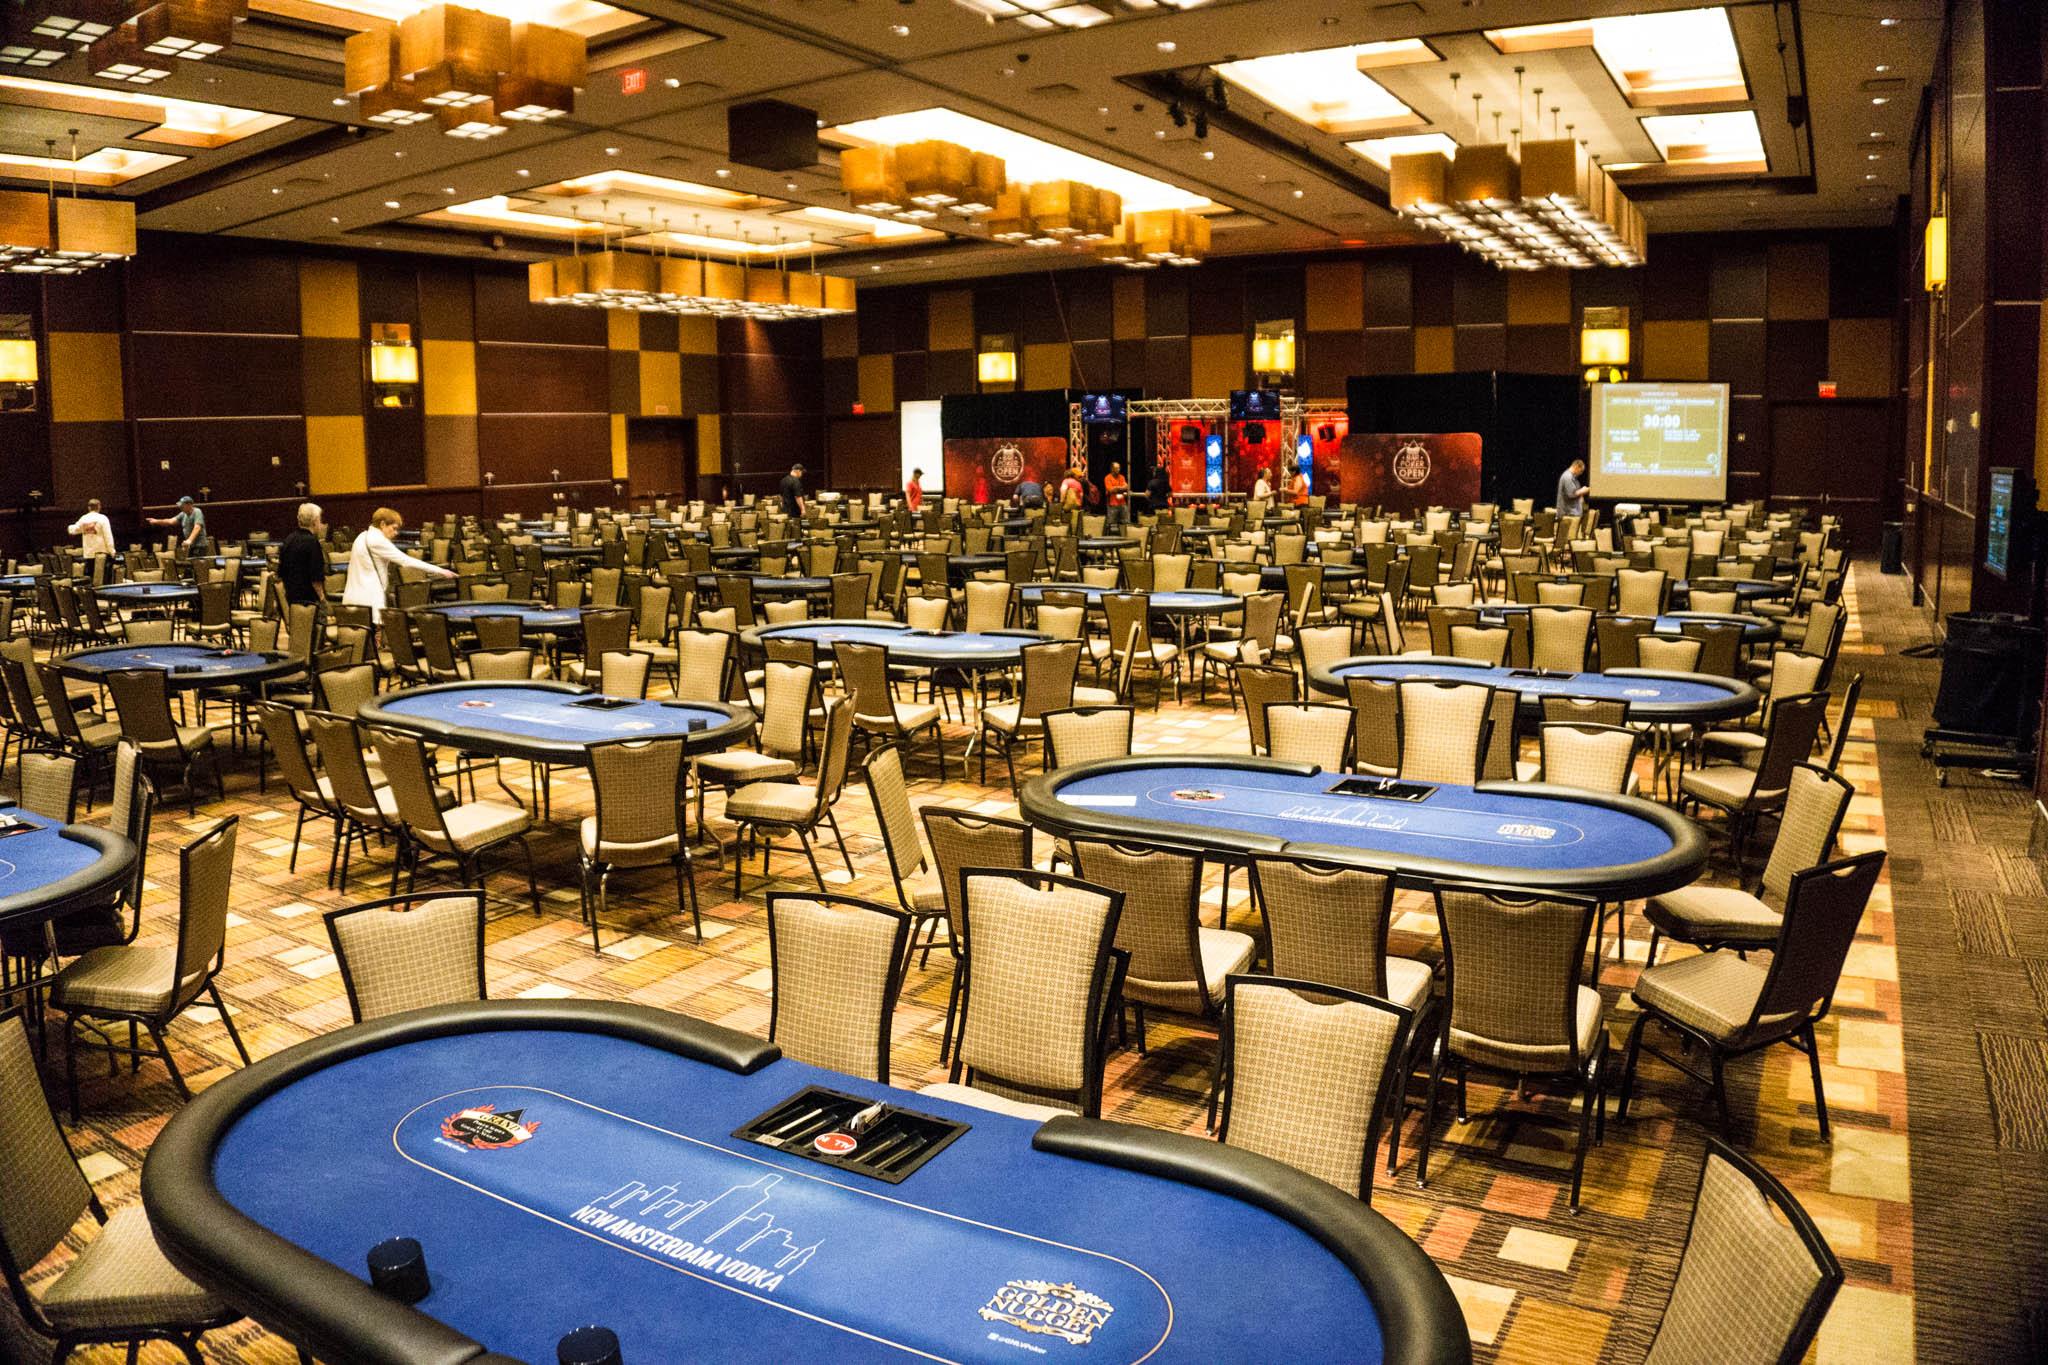 Golden nugget poker series 2017 reconnaitre cristal baccarat